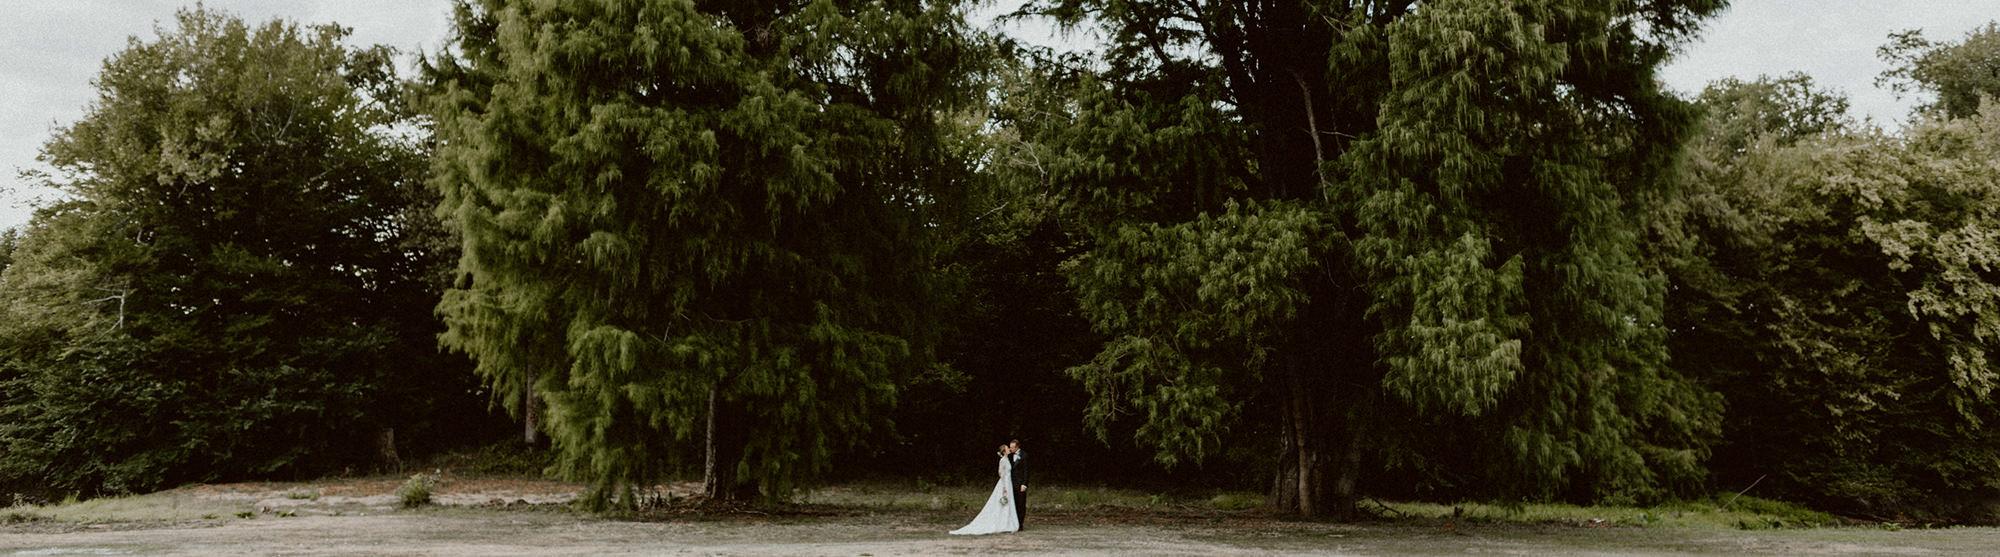 mariage chic champetre à orleans